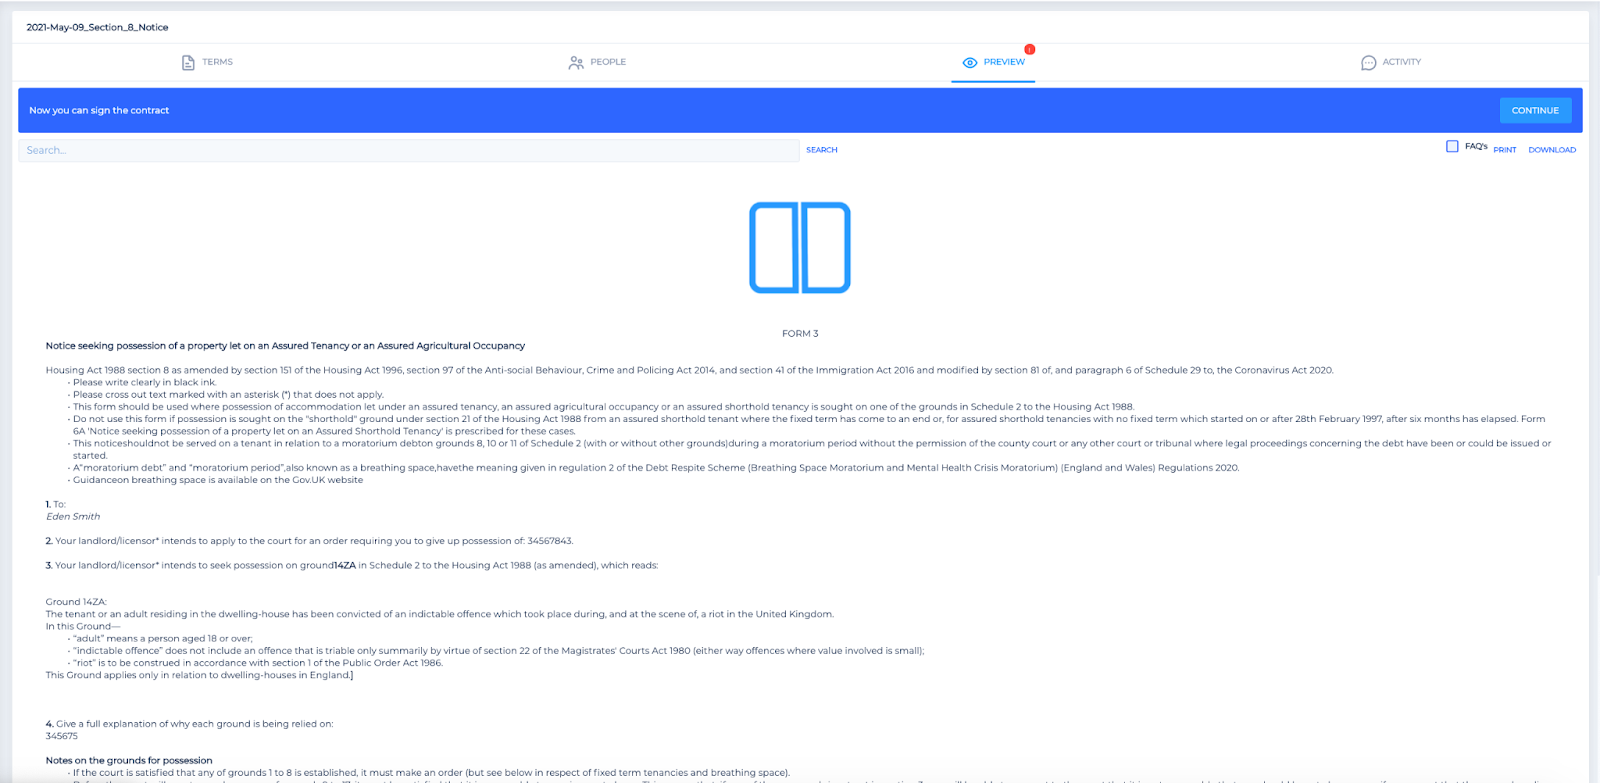 Screenshot of the Legislate contract